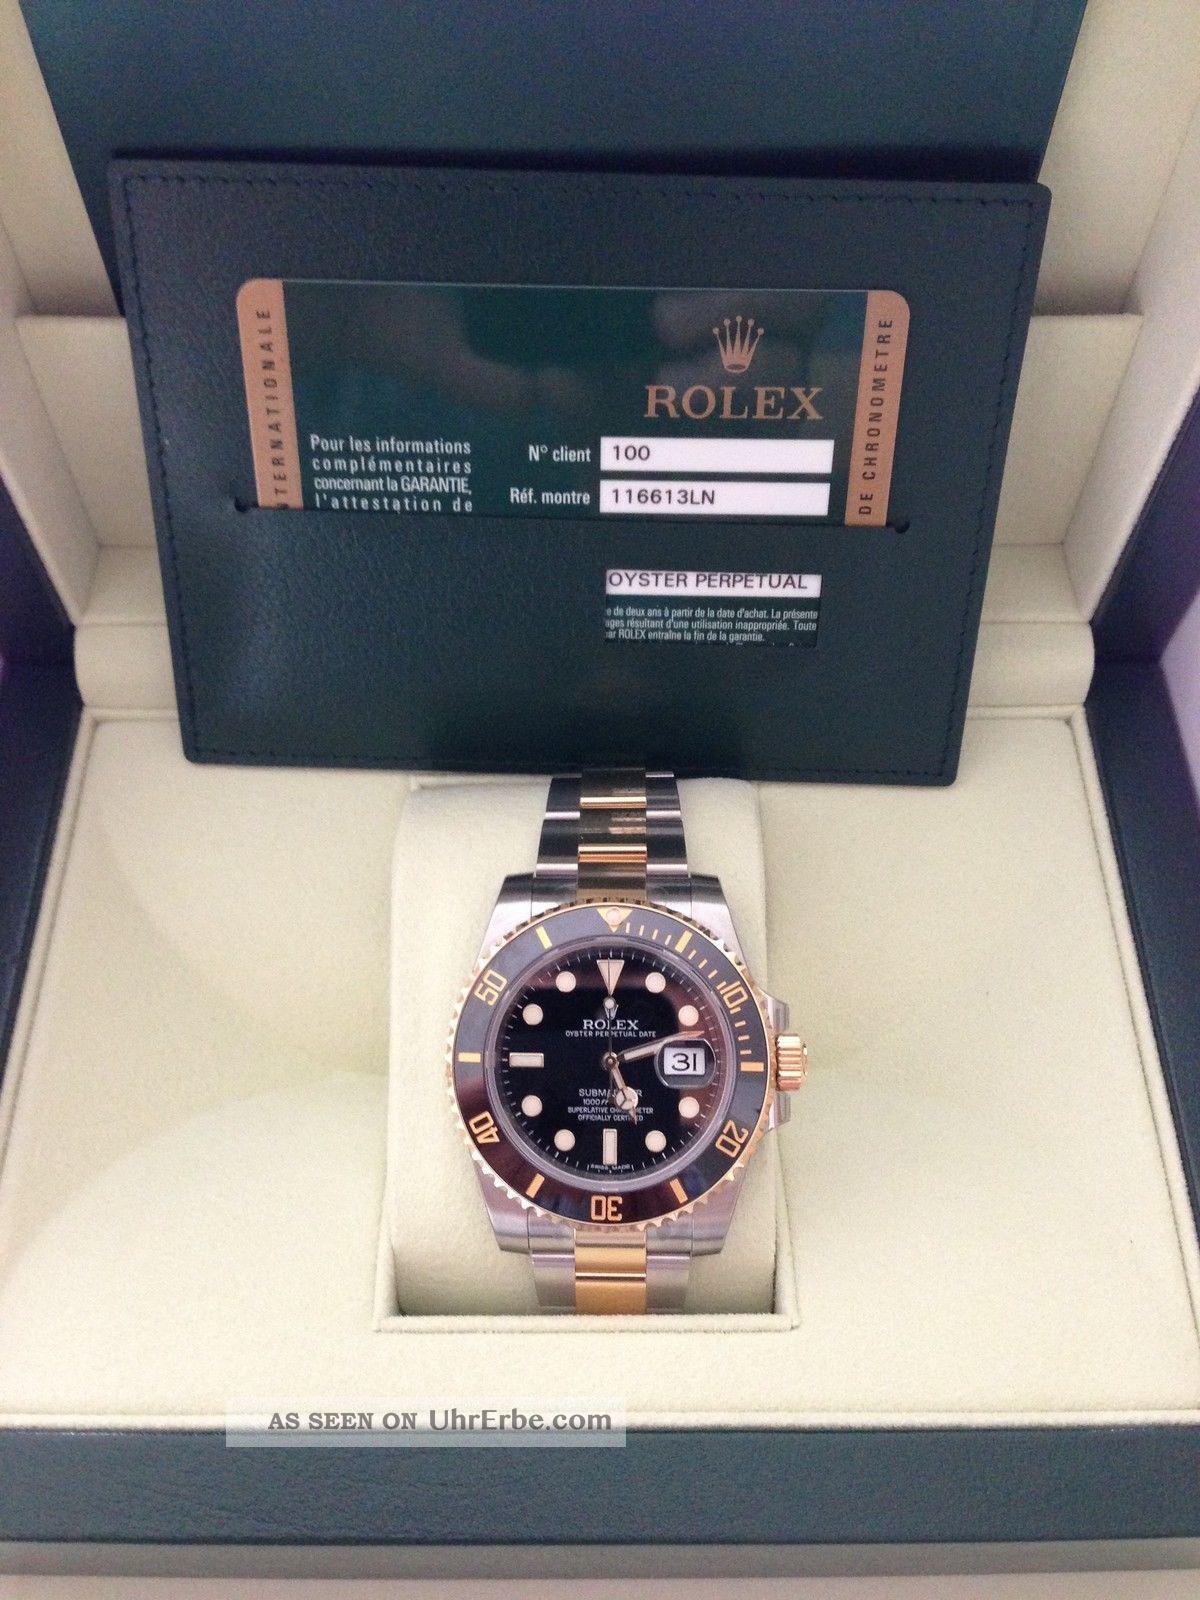 Rolex 116613ln 100 Gold Ref Stahl Lc Submariner oWQxBCerd